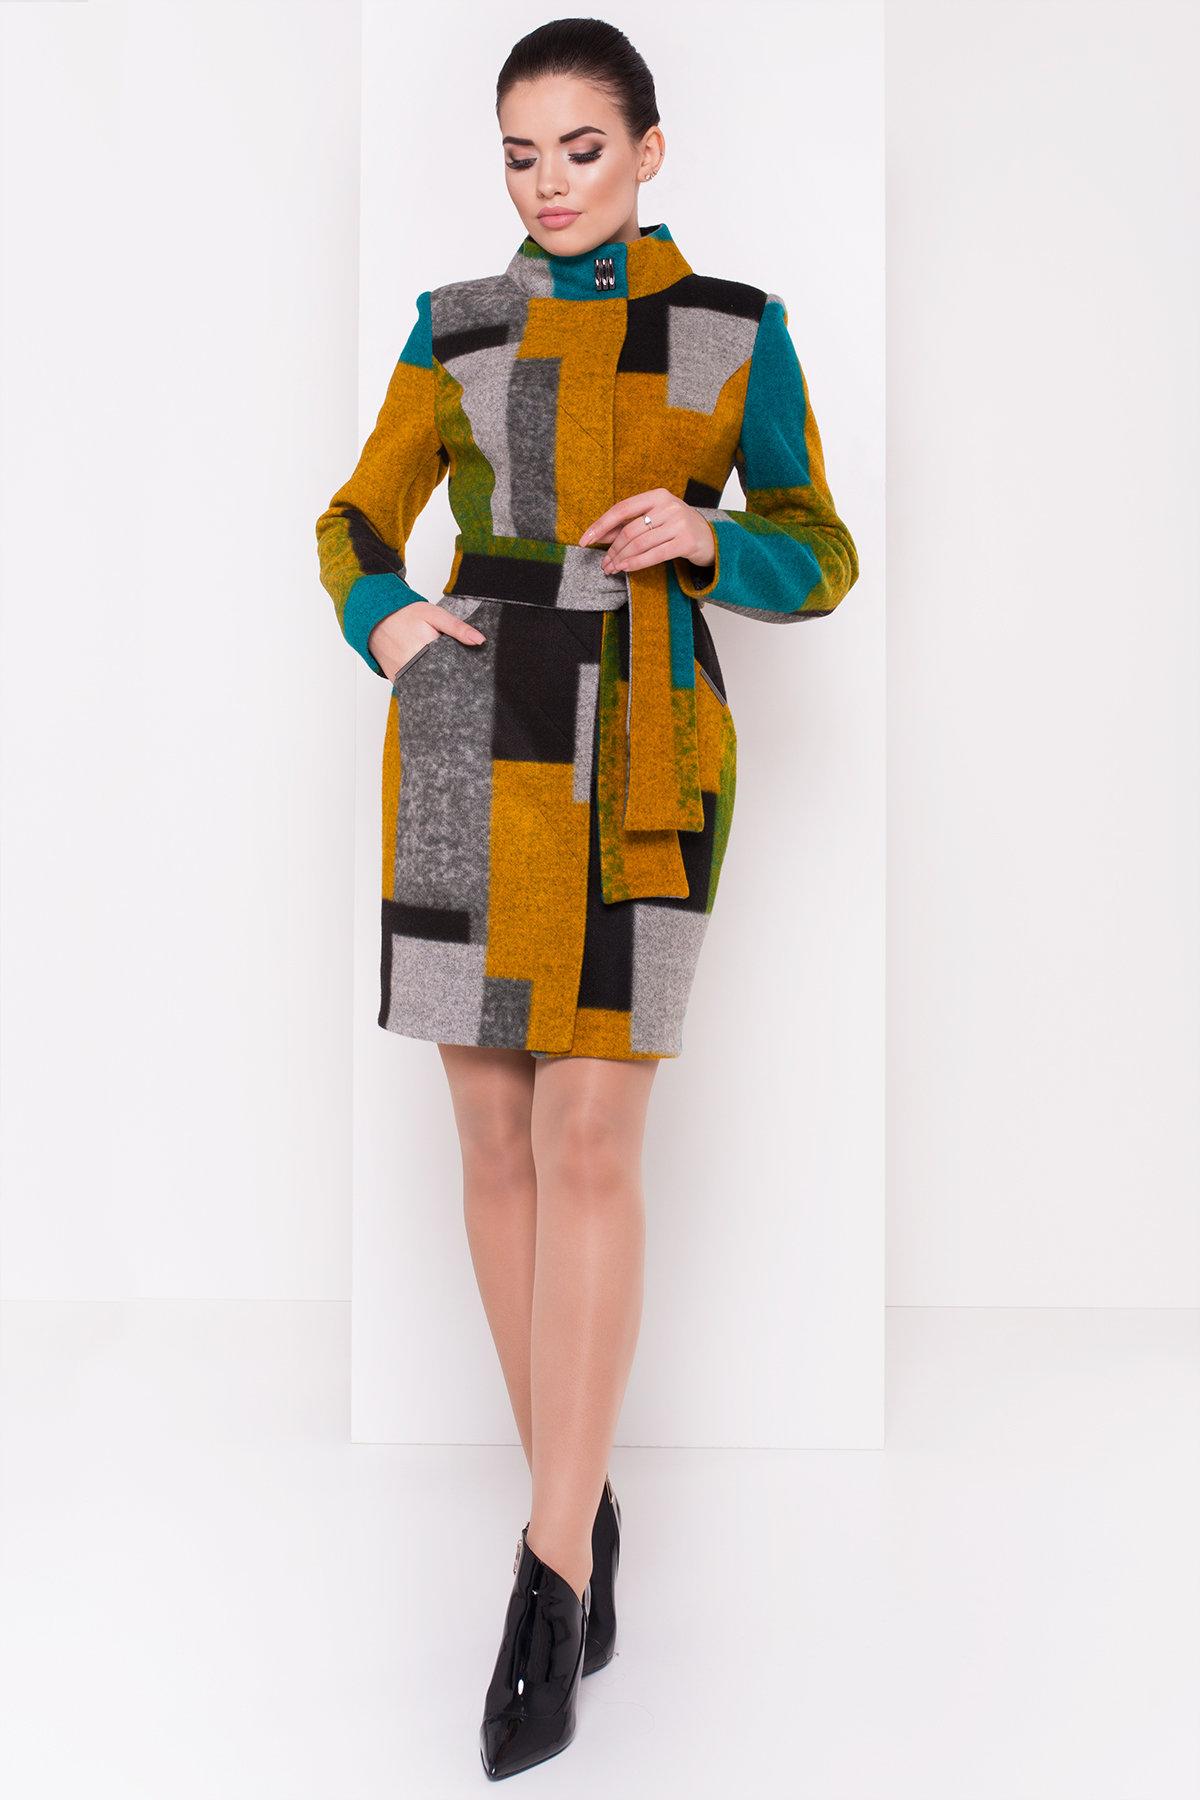 Пальто Луара 0505 Цвет: Черный/серый/бирюза Д3/С1